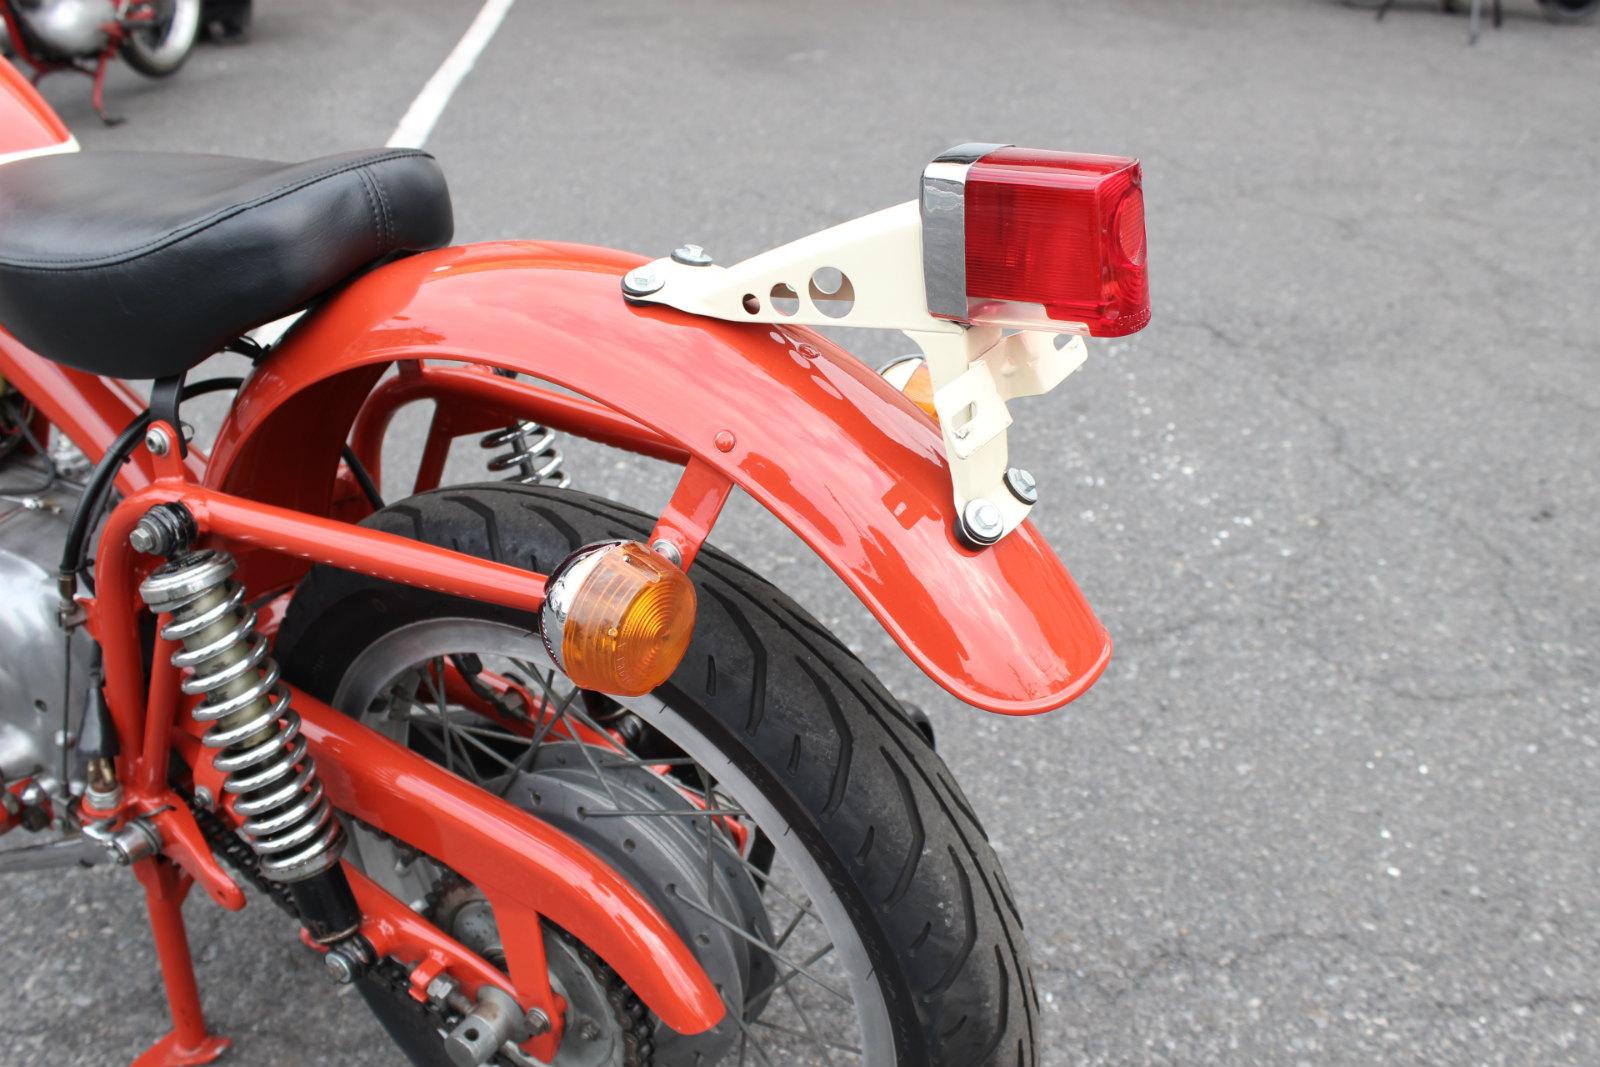 Harley Davidson Sprint_a0208987_14132692.jpg